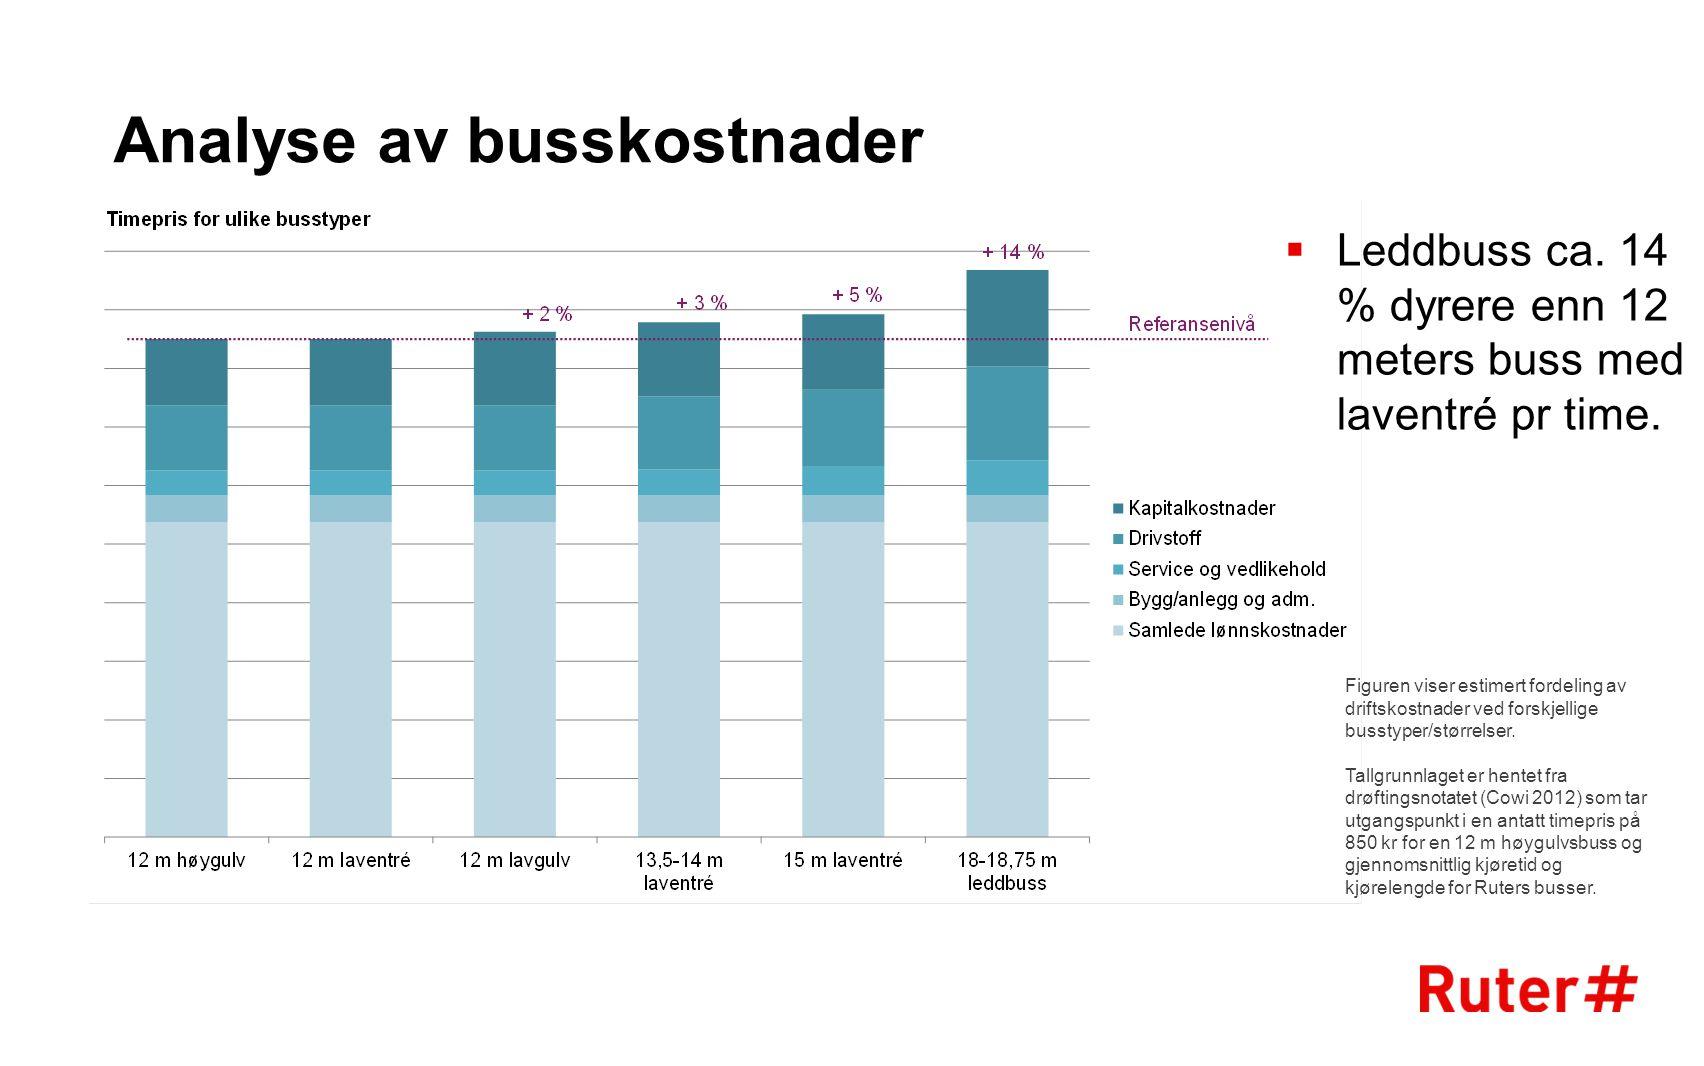 Analyse av busskostnader